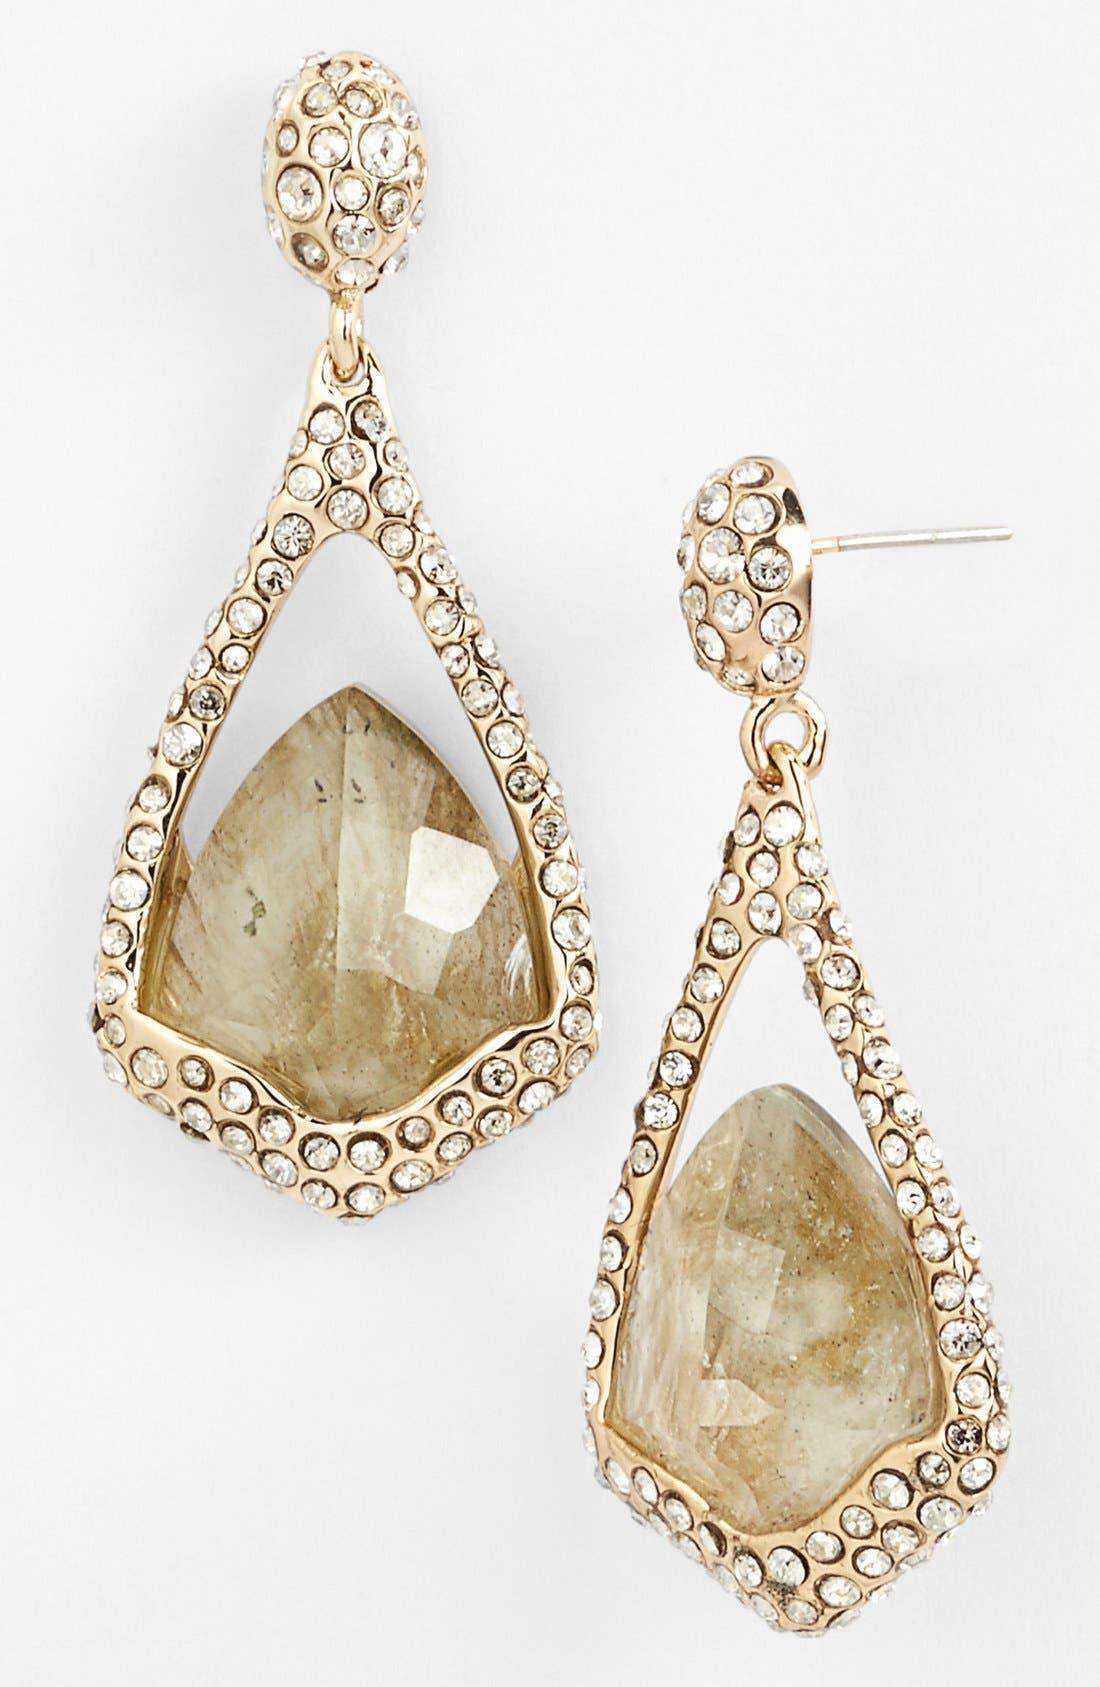 Main Image - Alexis Bittar 'Miss Havisham' Doublet Drop Earrings